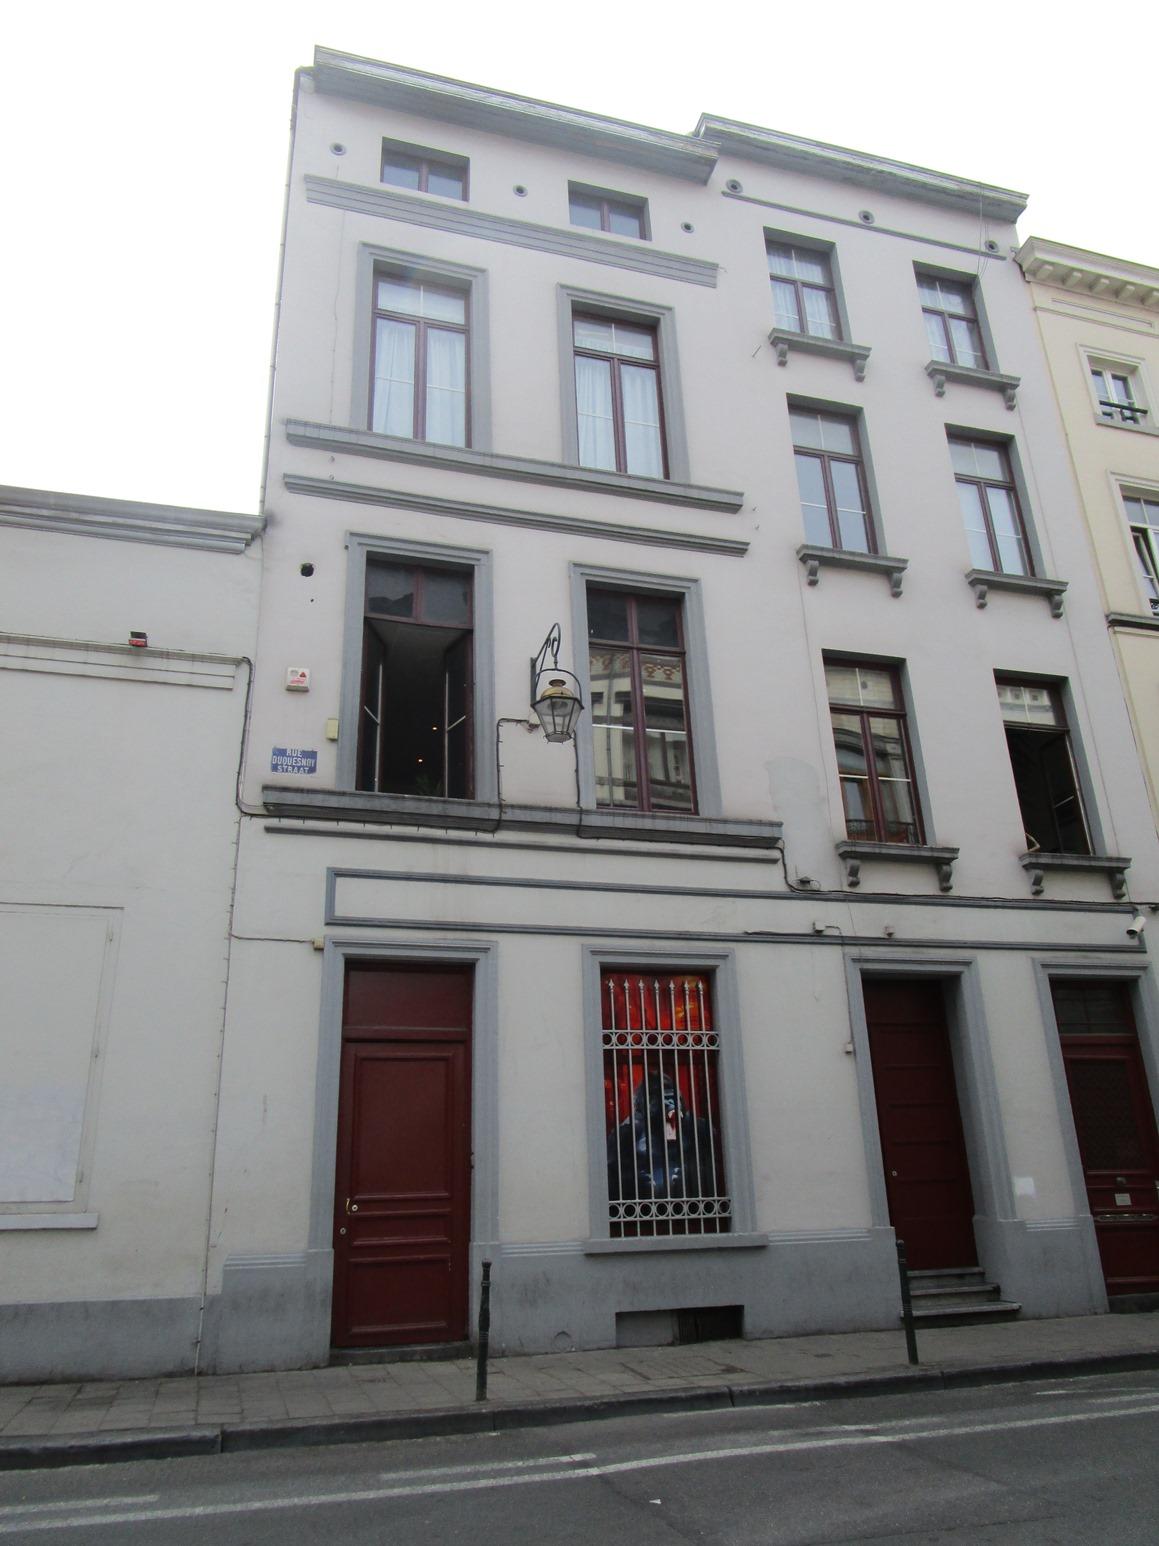 Rue Duquesnoy 18, 2015